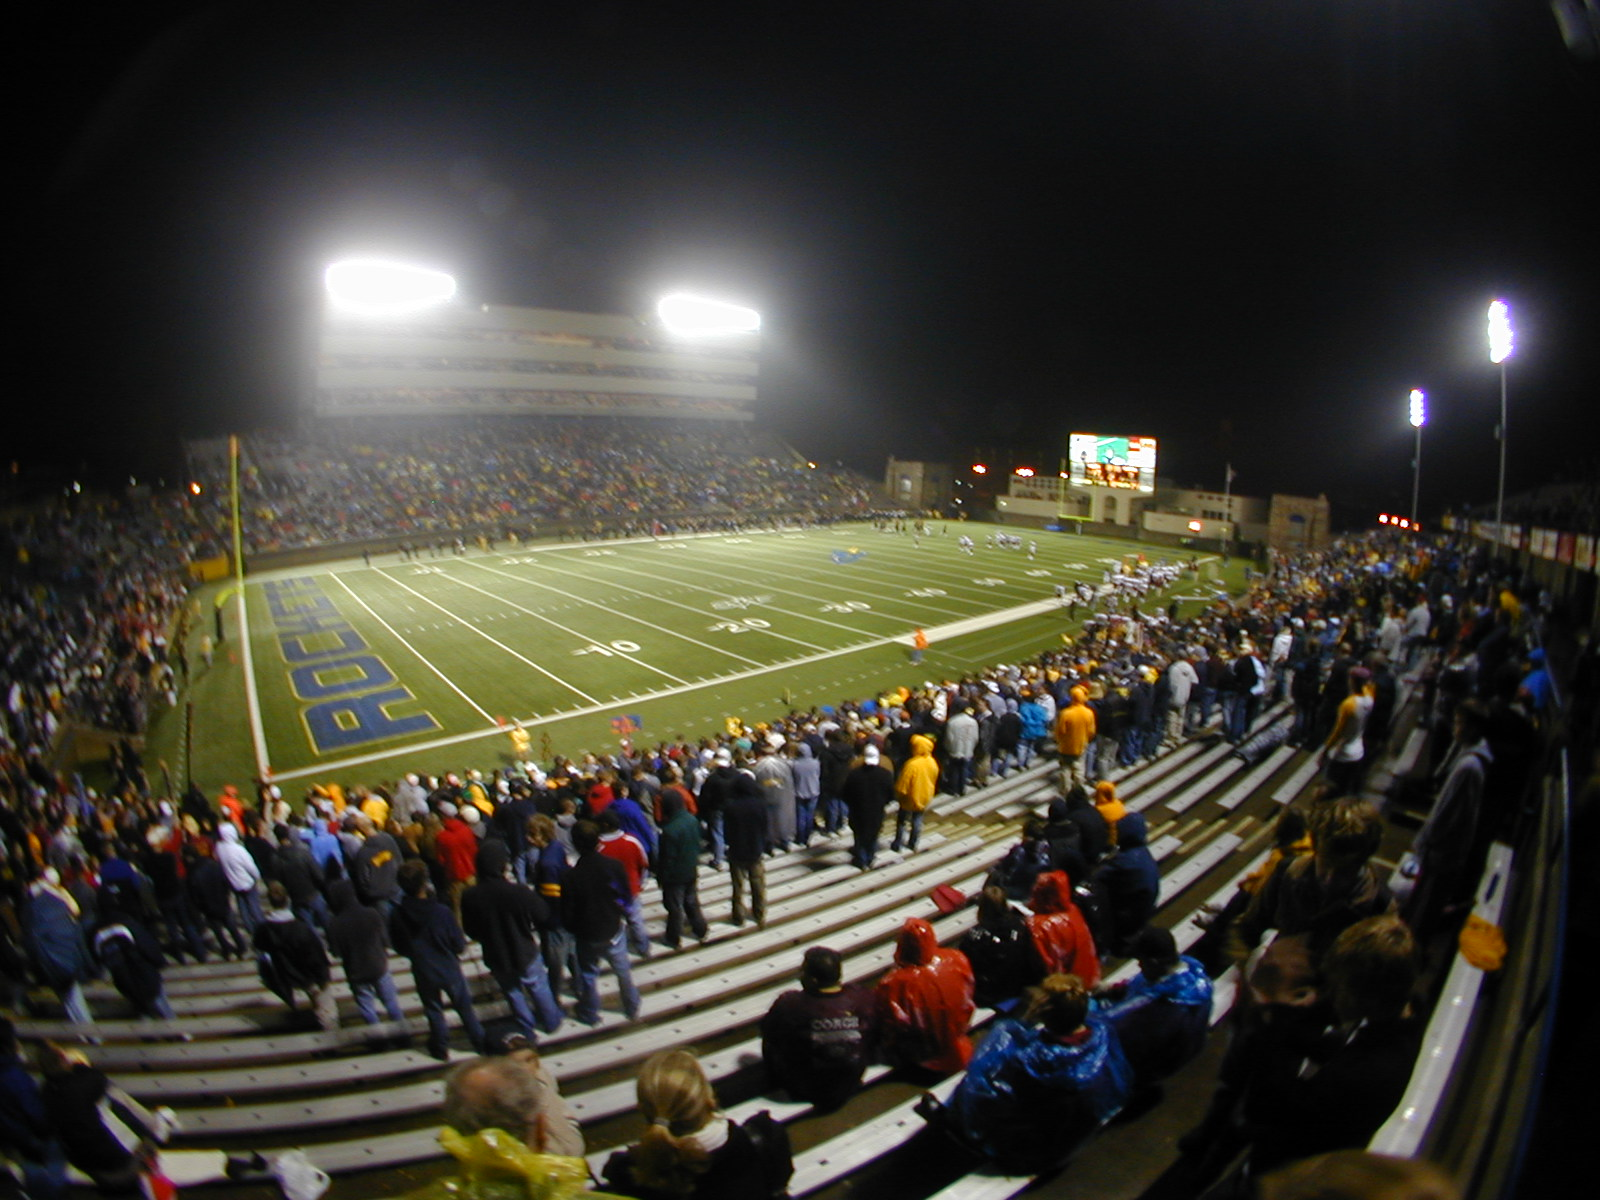 Wittenberg University Football Stadium